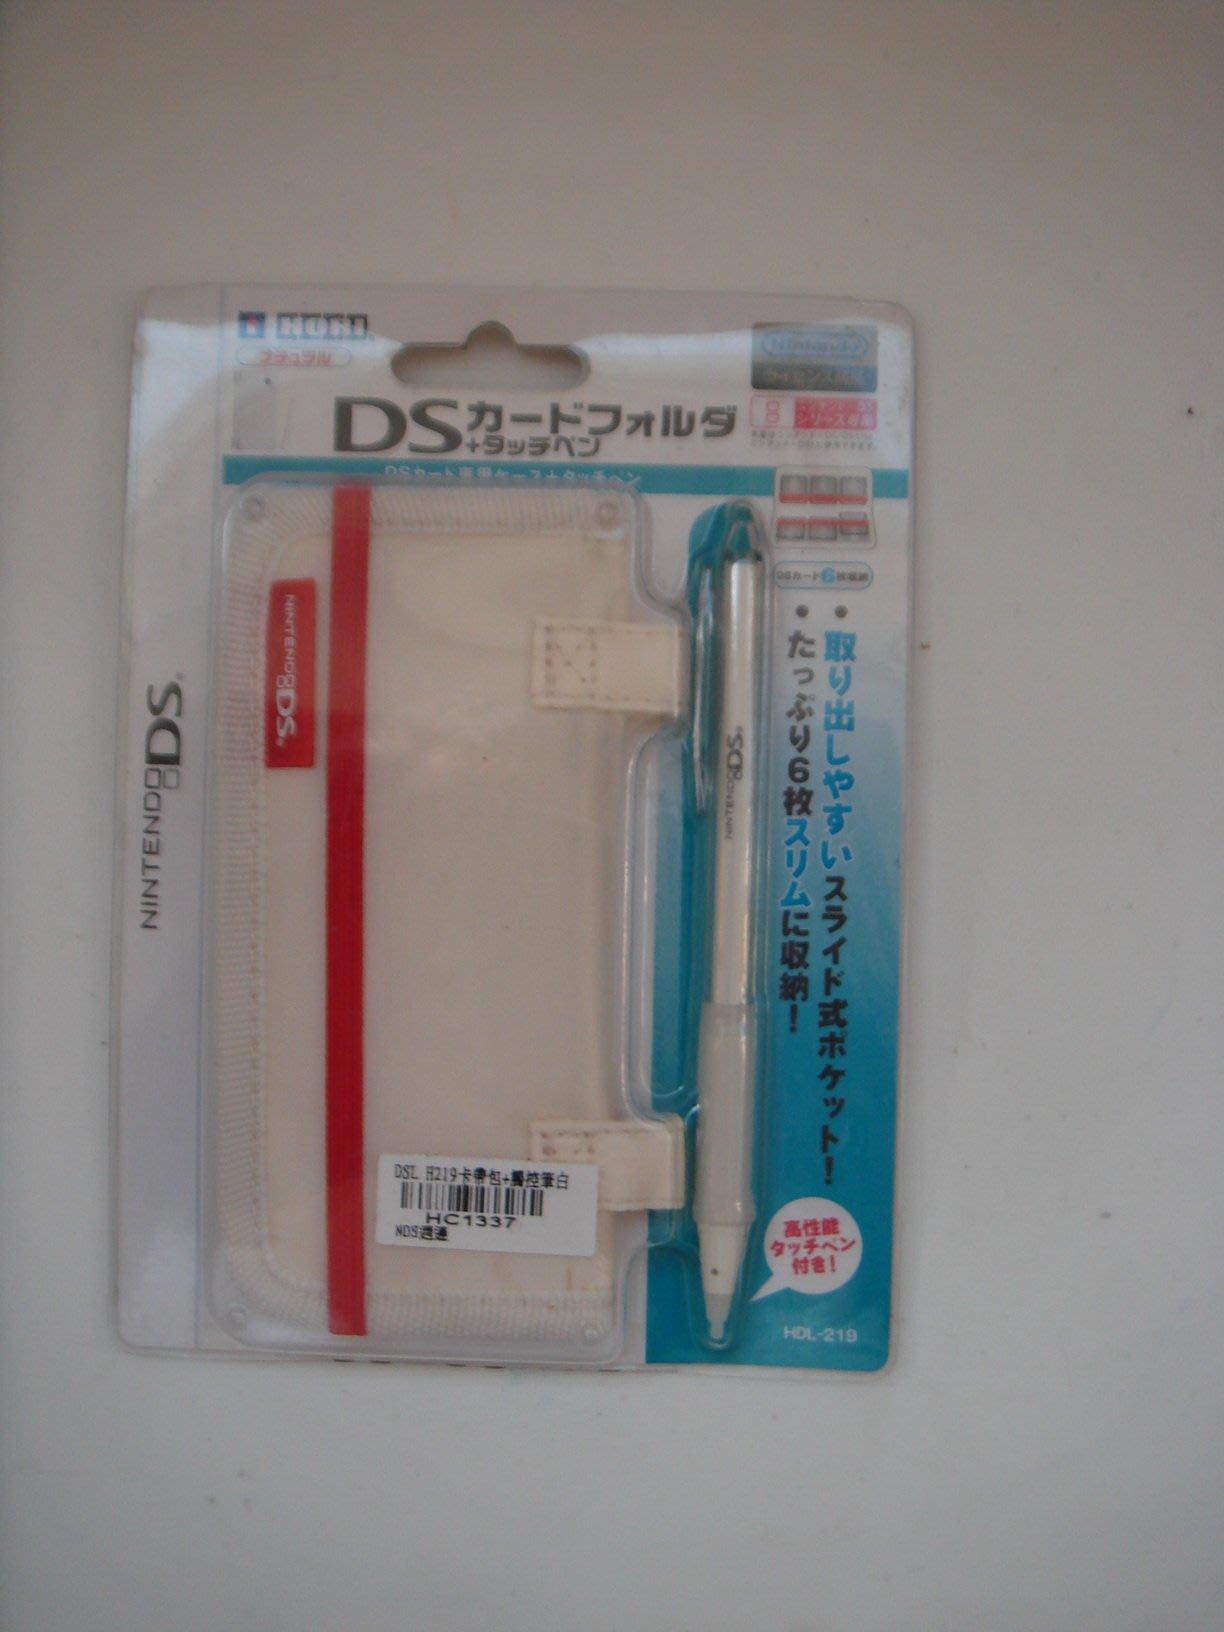 NEW 3DS NDSL NDSi 米白色 卡帶收納包 (可收納6枚卡帶) + 觸控筆 HDL-219 HORI